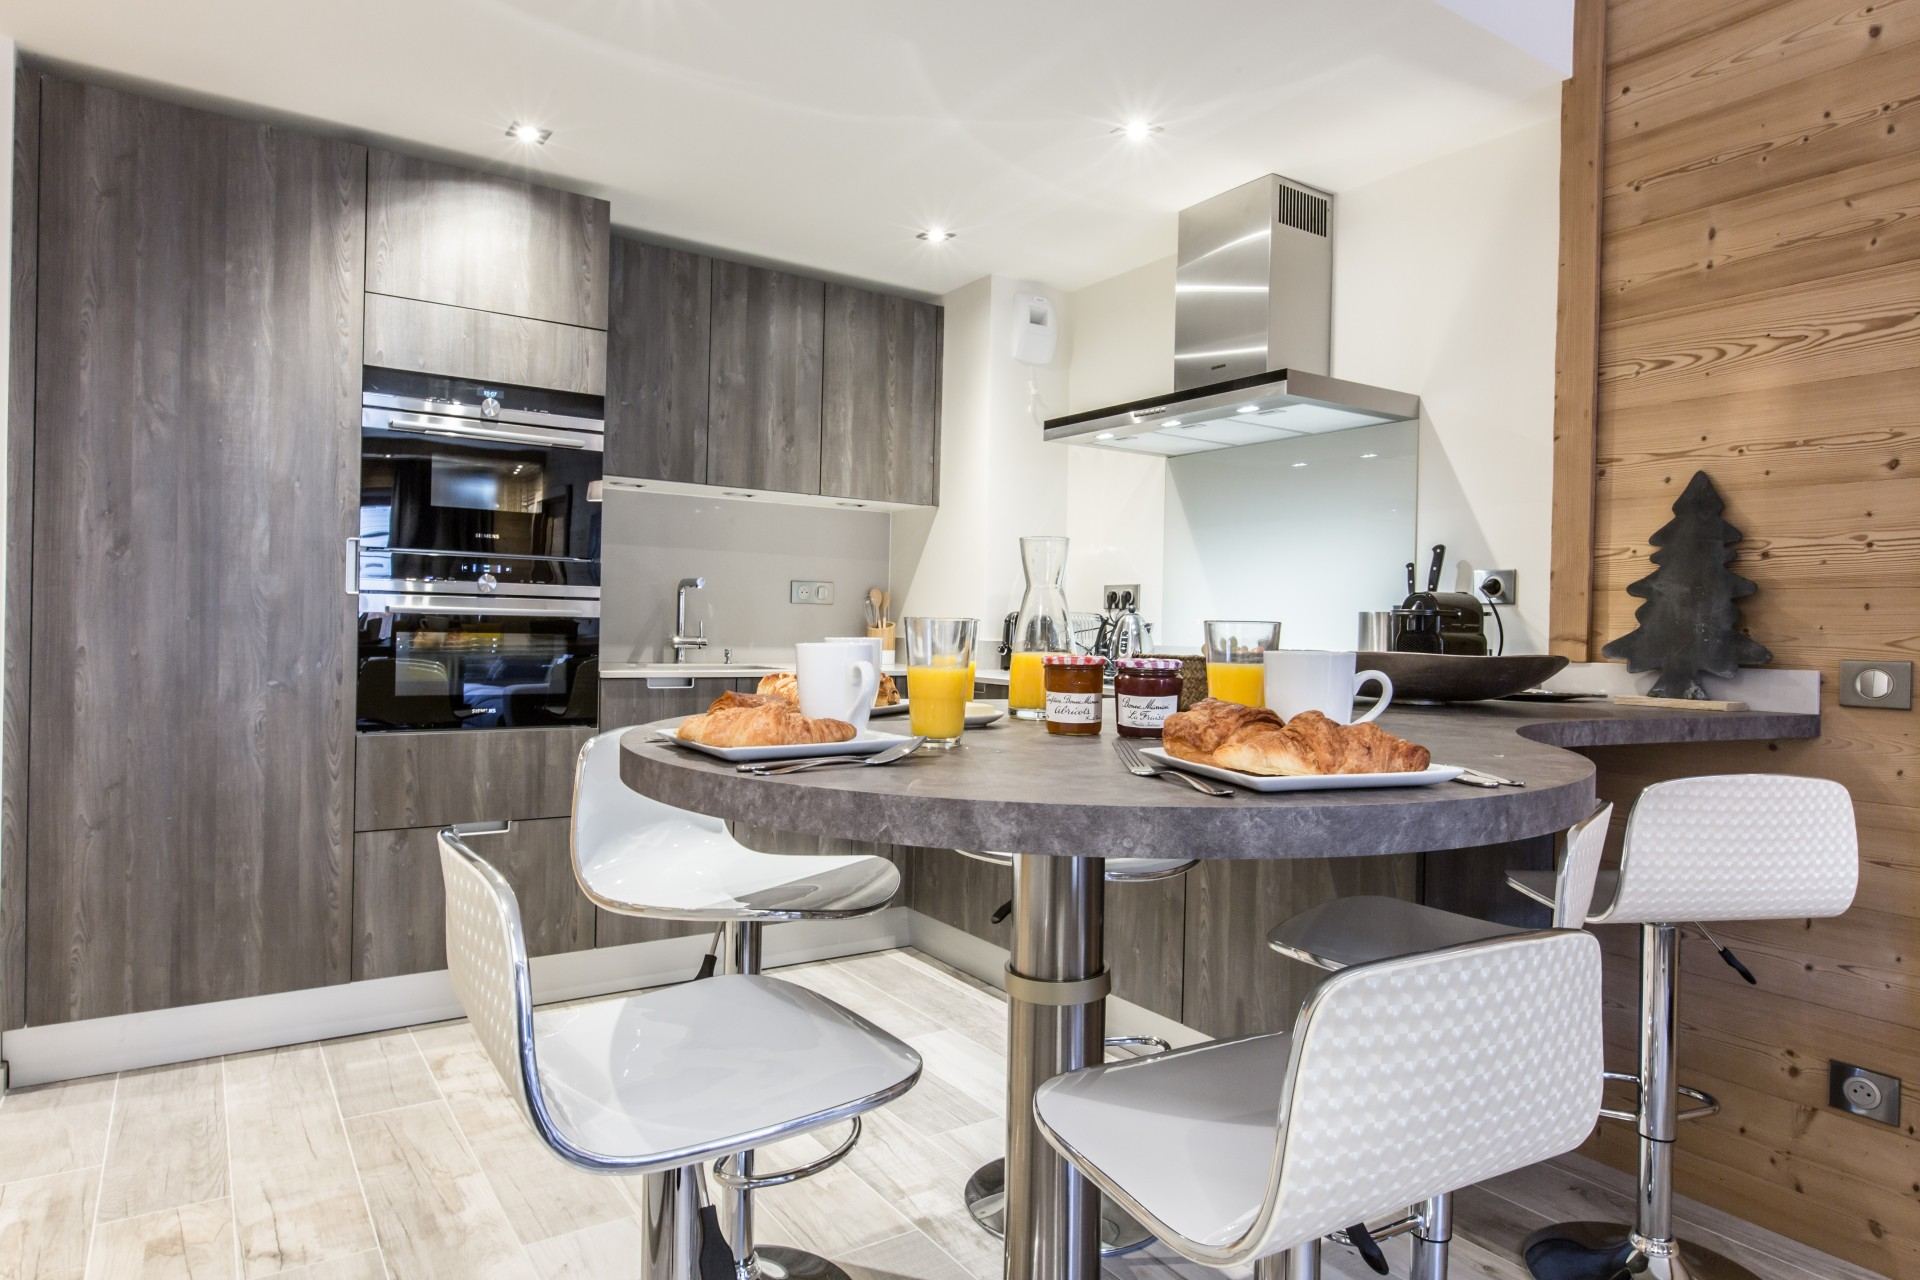 Courchevel 1650 Location Appartement Luxe Amicite Cuisine 2